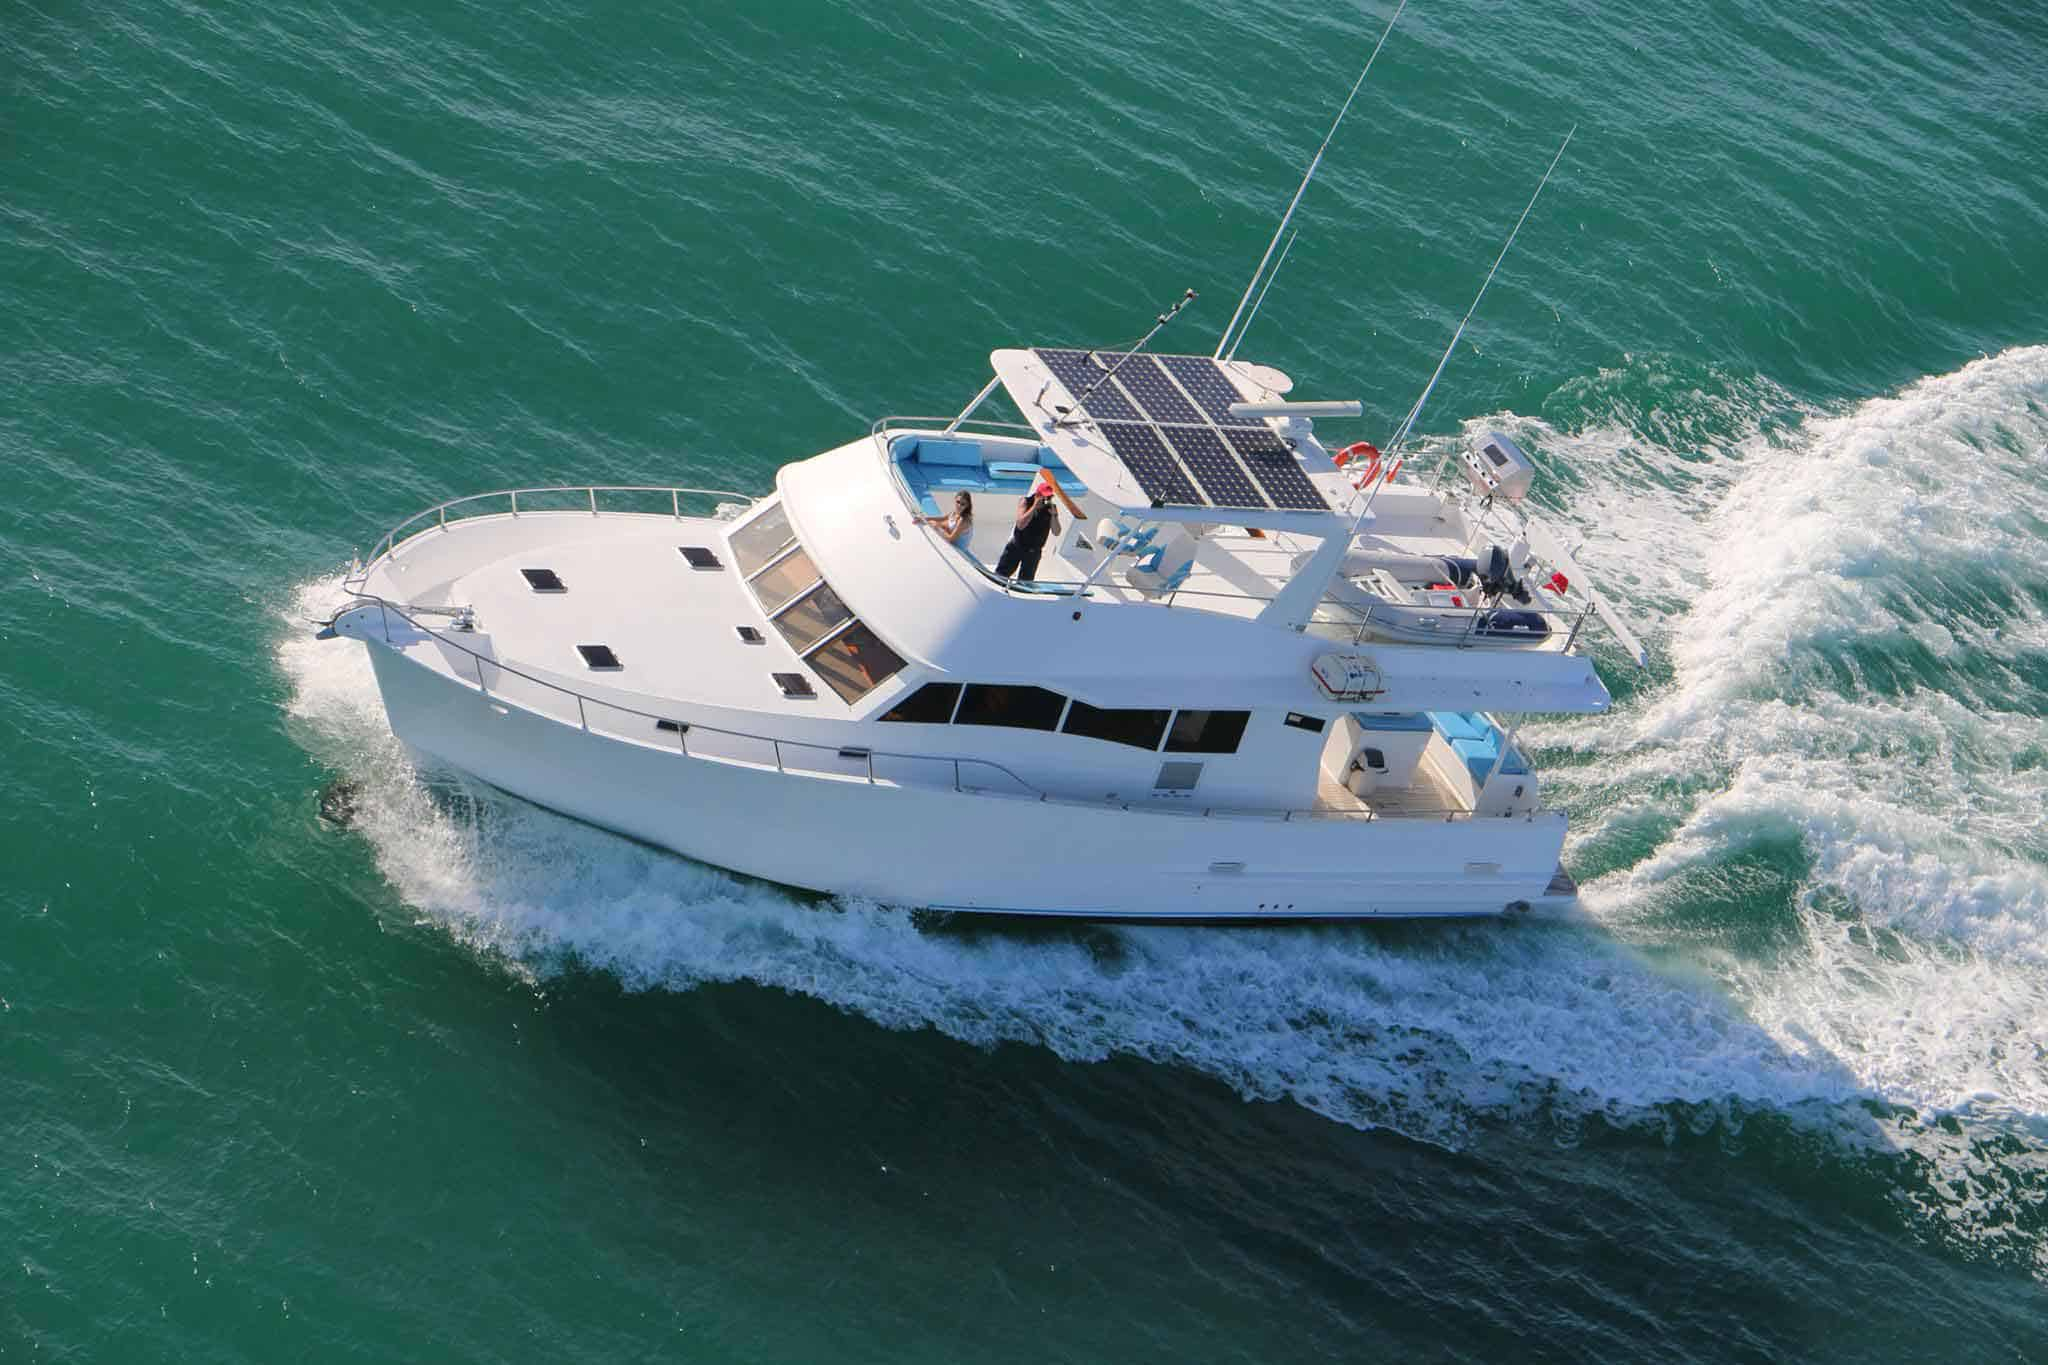 Monsoon Luxury Charter boat